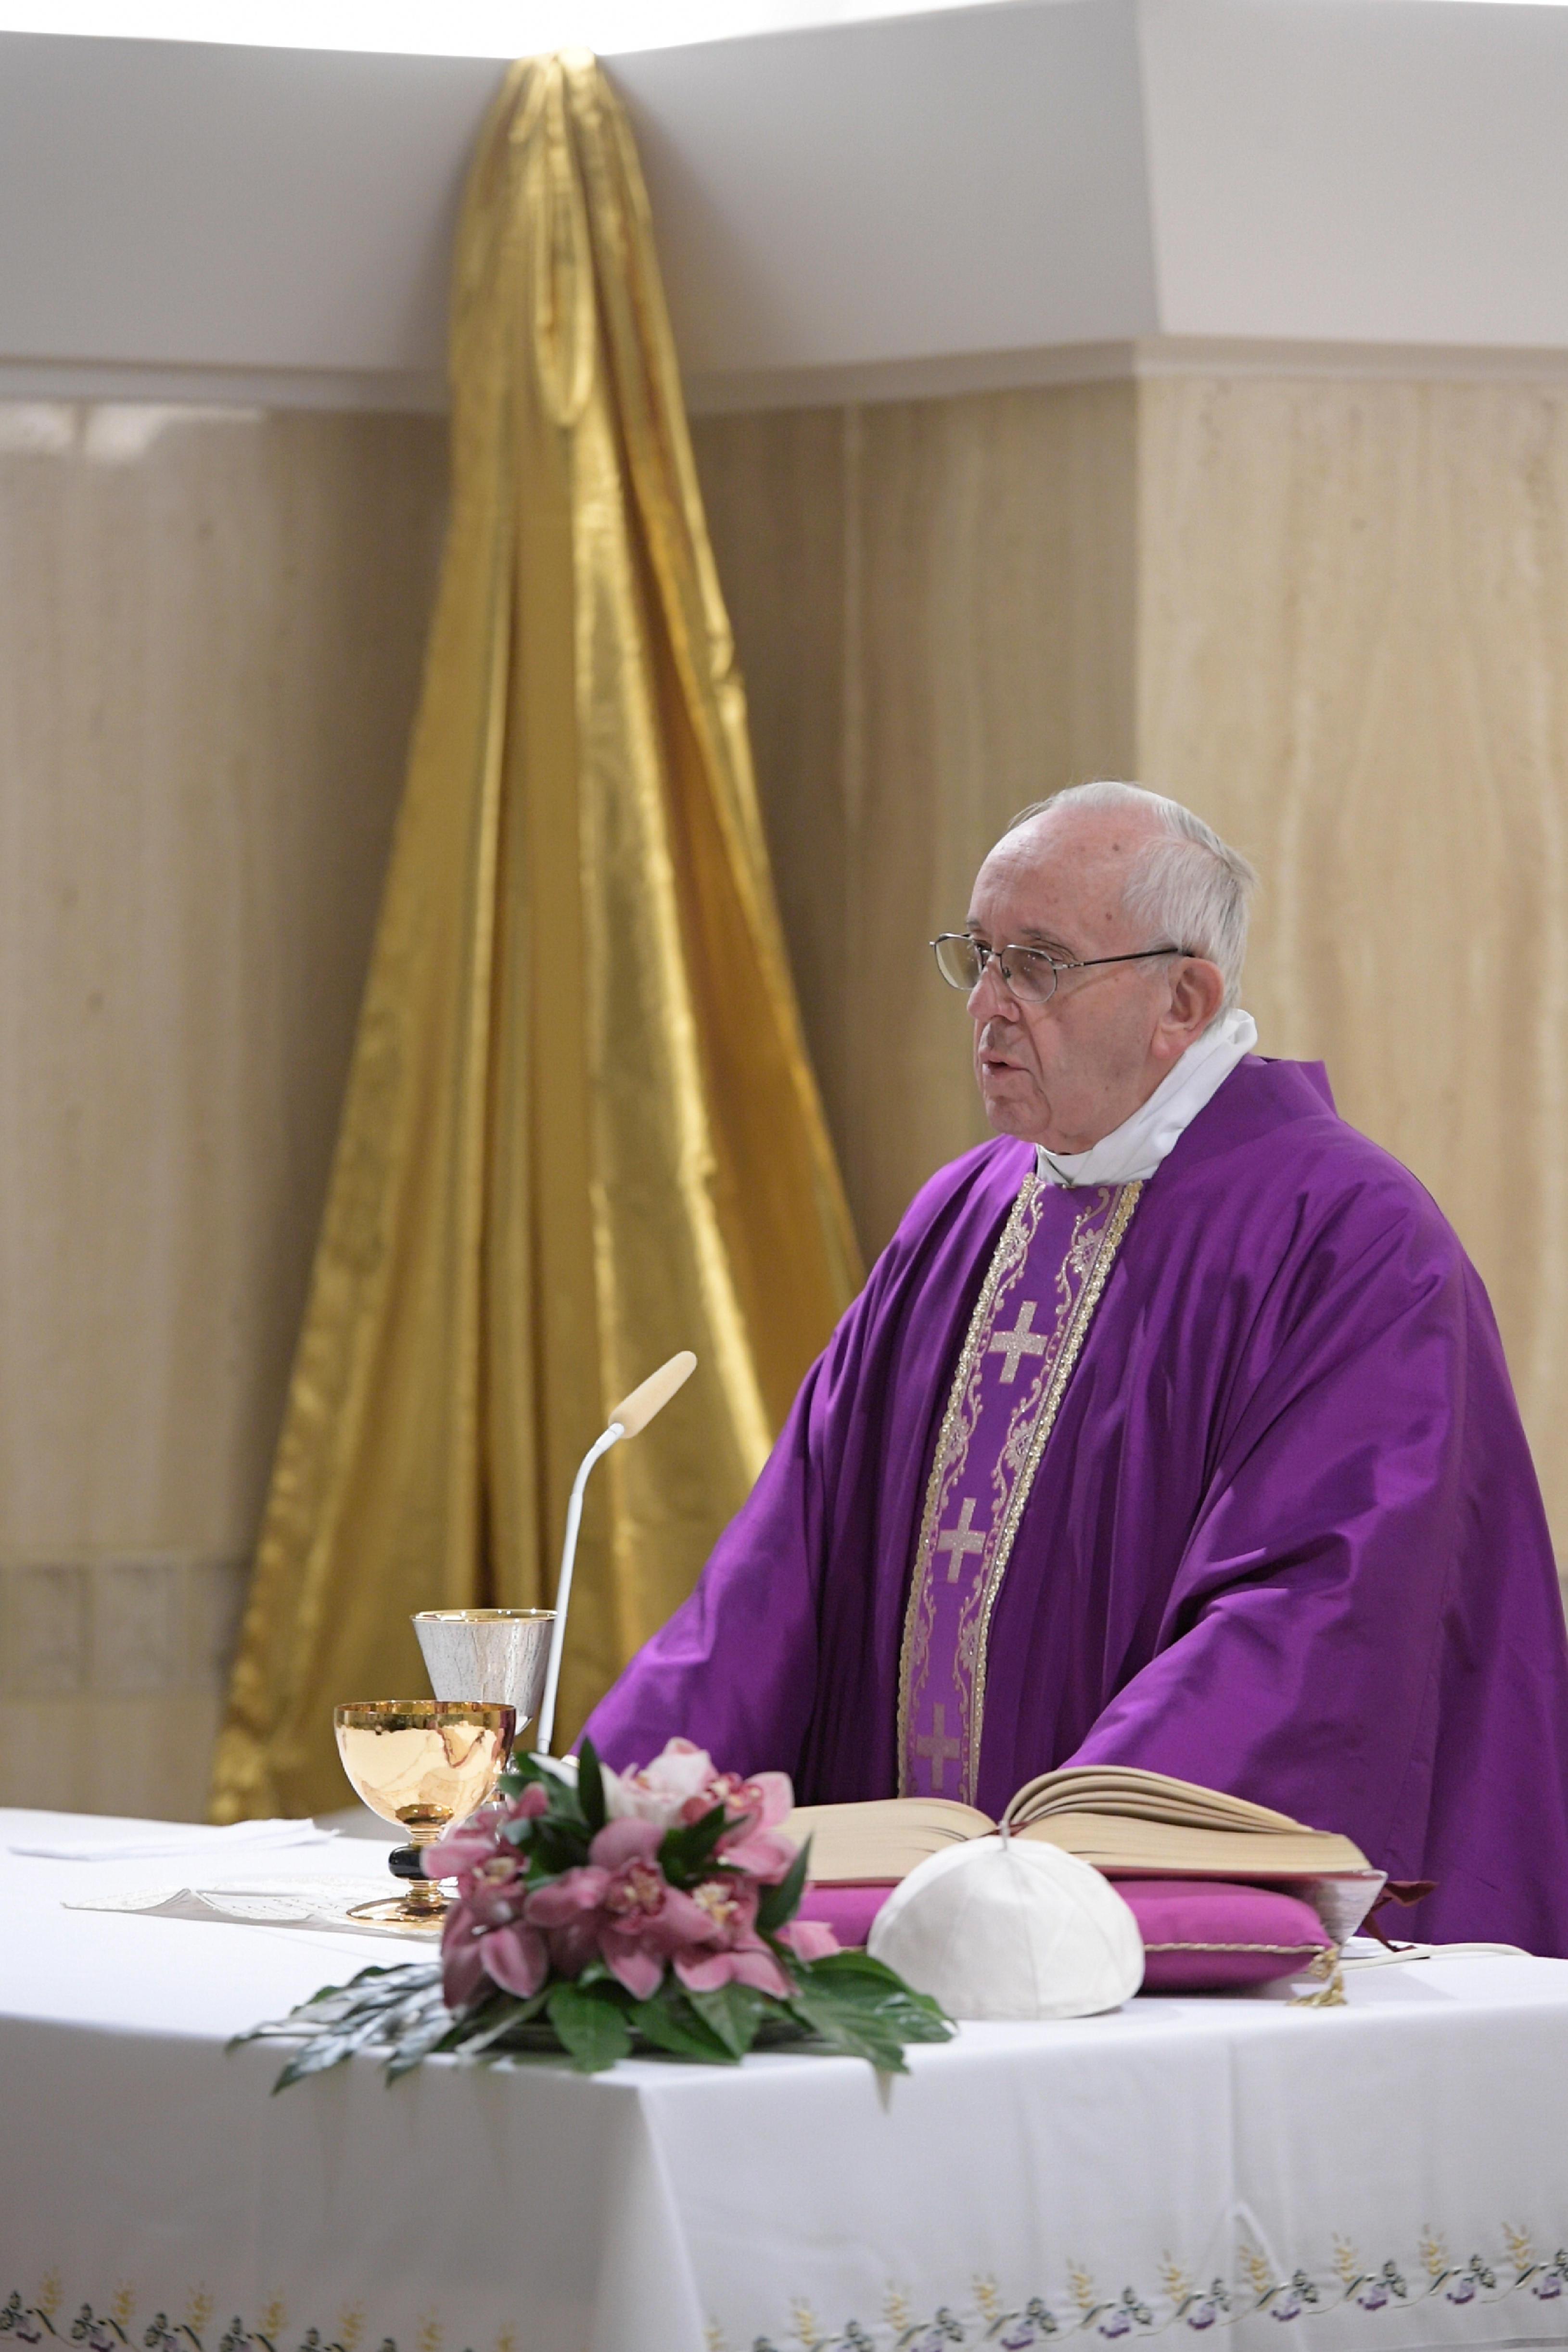 Messe à Sainte-Marthe, 19/12/2017 © L'Osservatore Romano